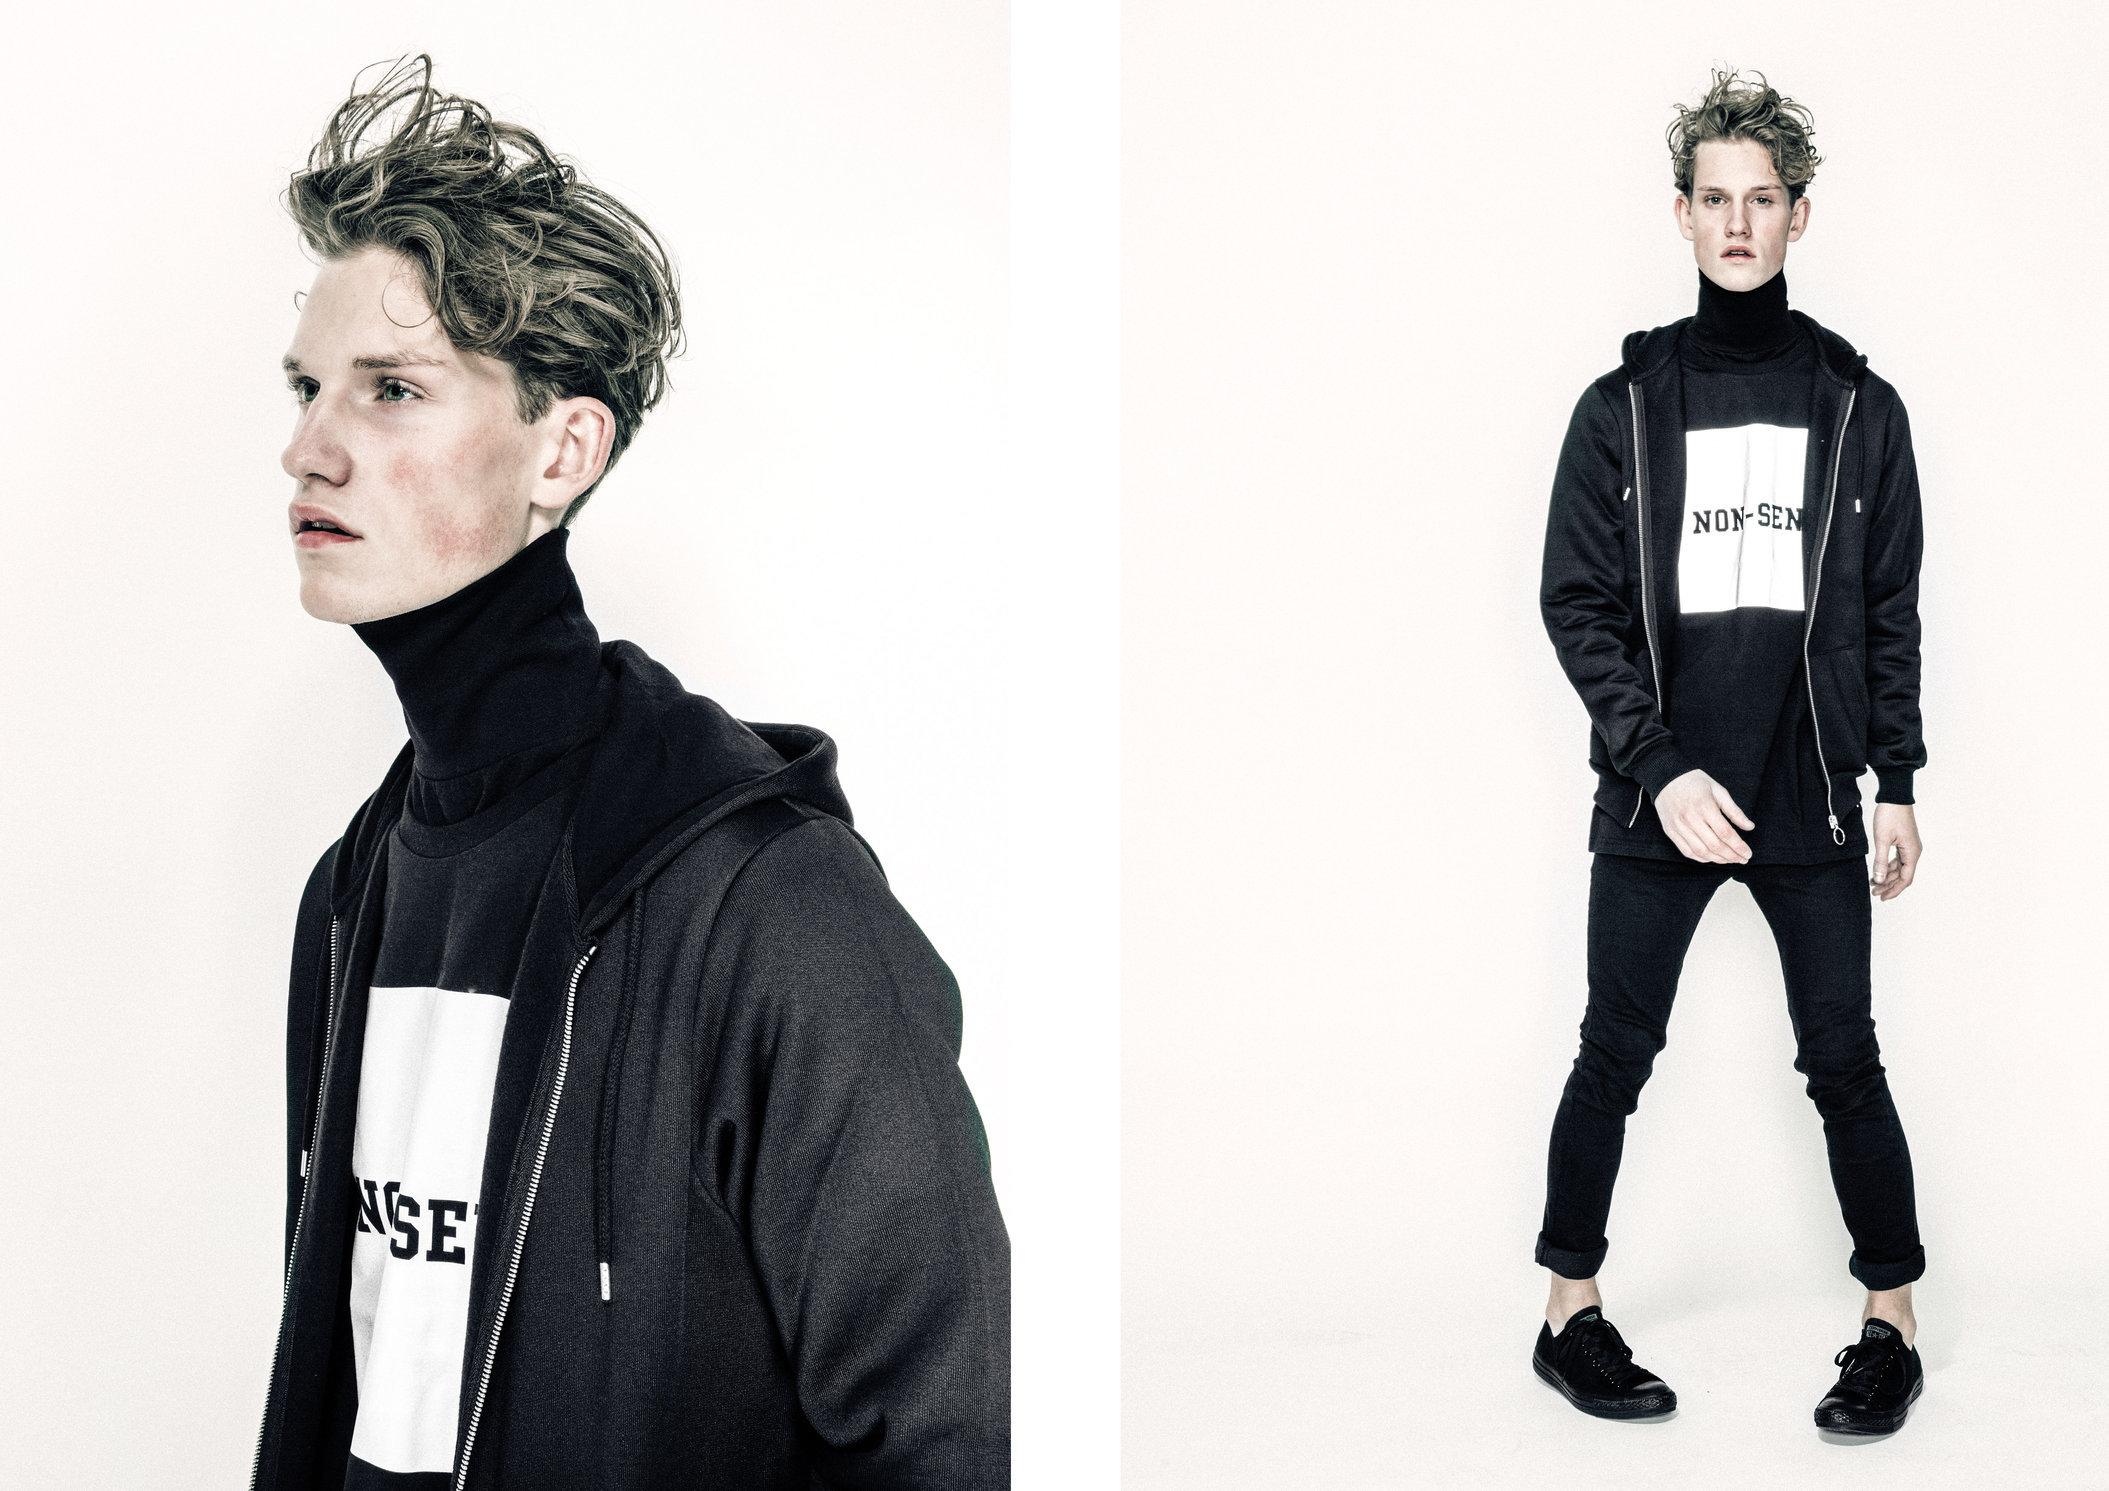 Lasse S - Diva models